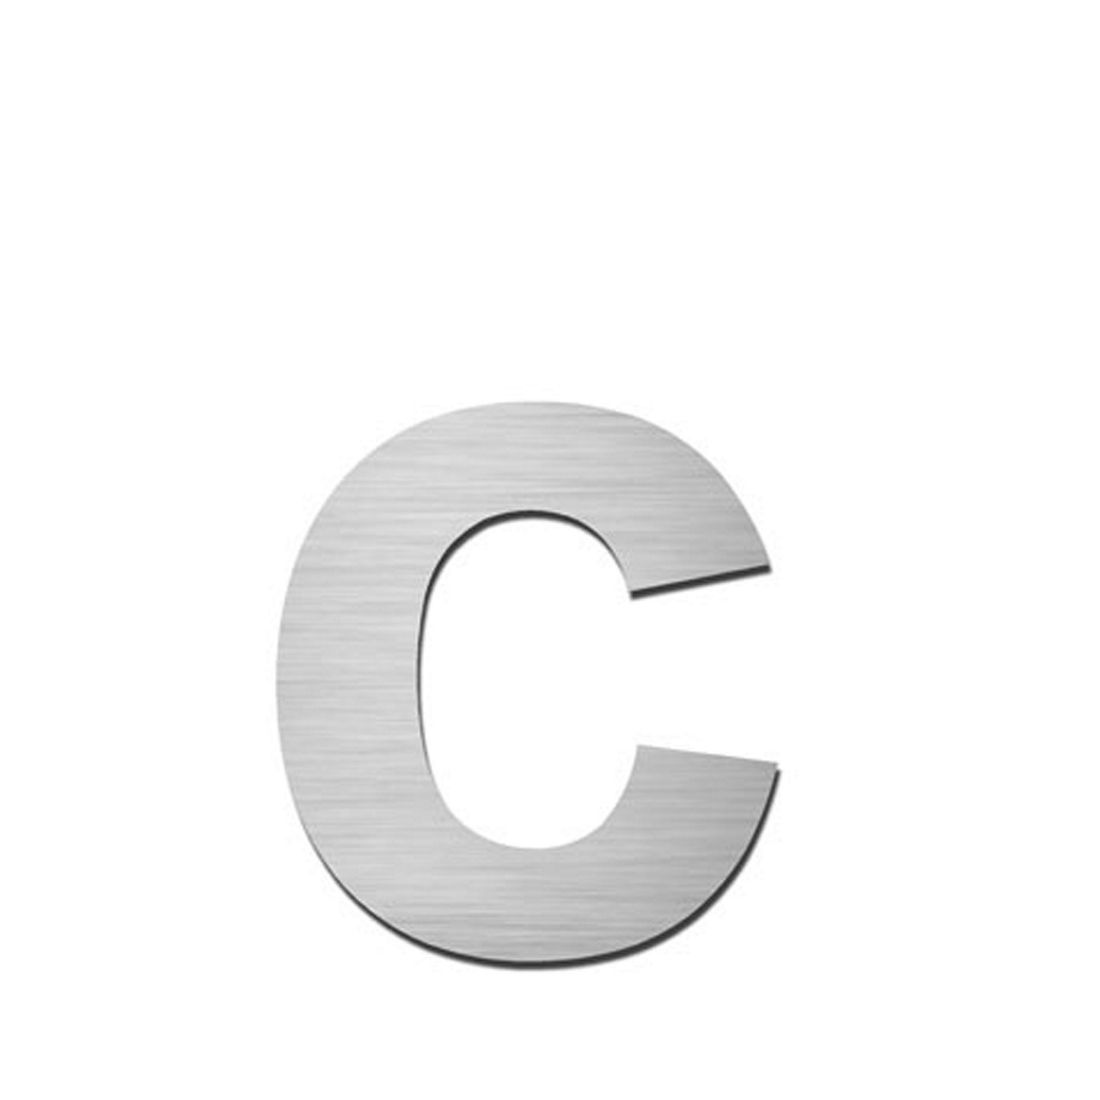 Hausnummer Index zum Aufkleben c - Matt Gebürstet Edelstahl Matt Gebürstet Silber, Serafini